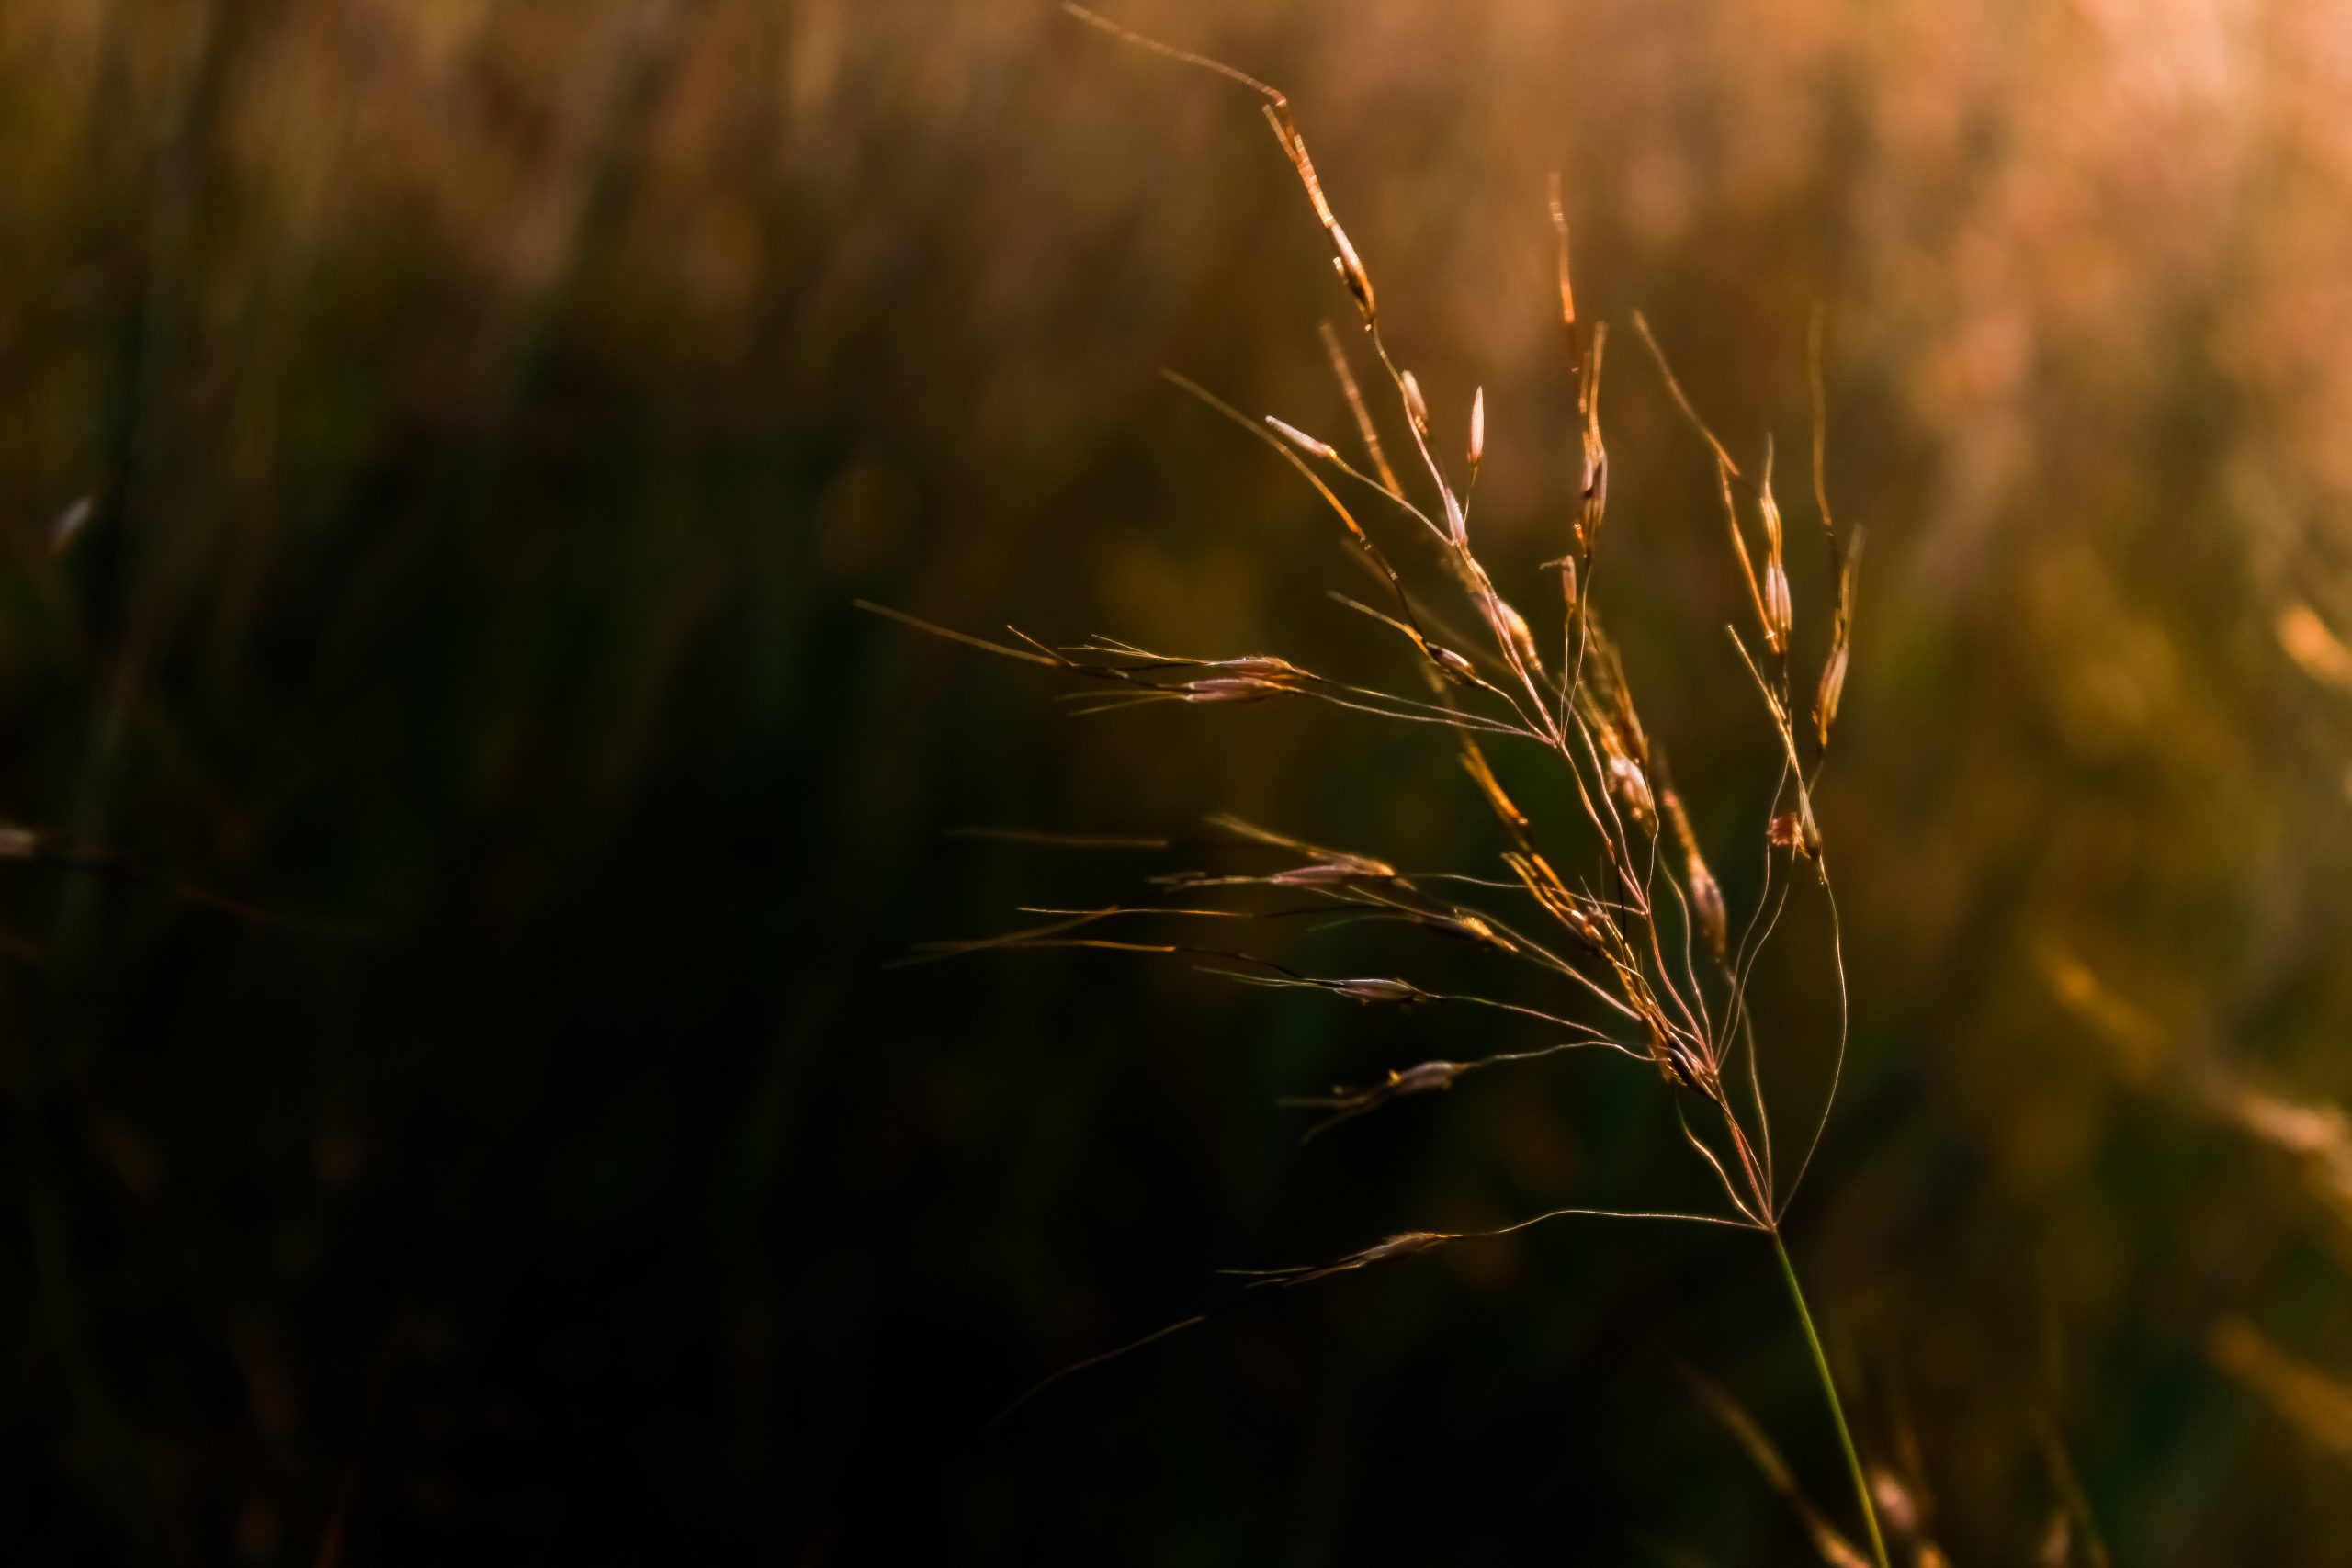 A grass plant